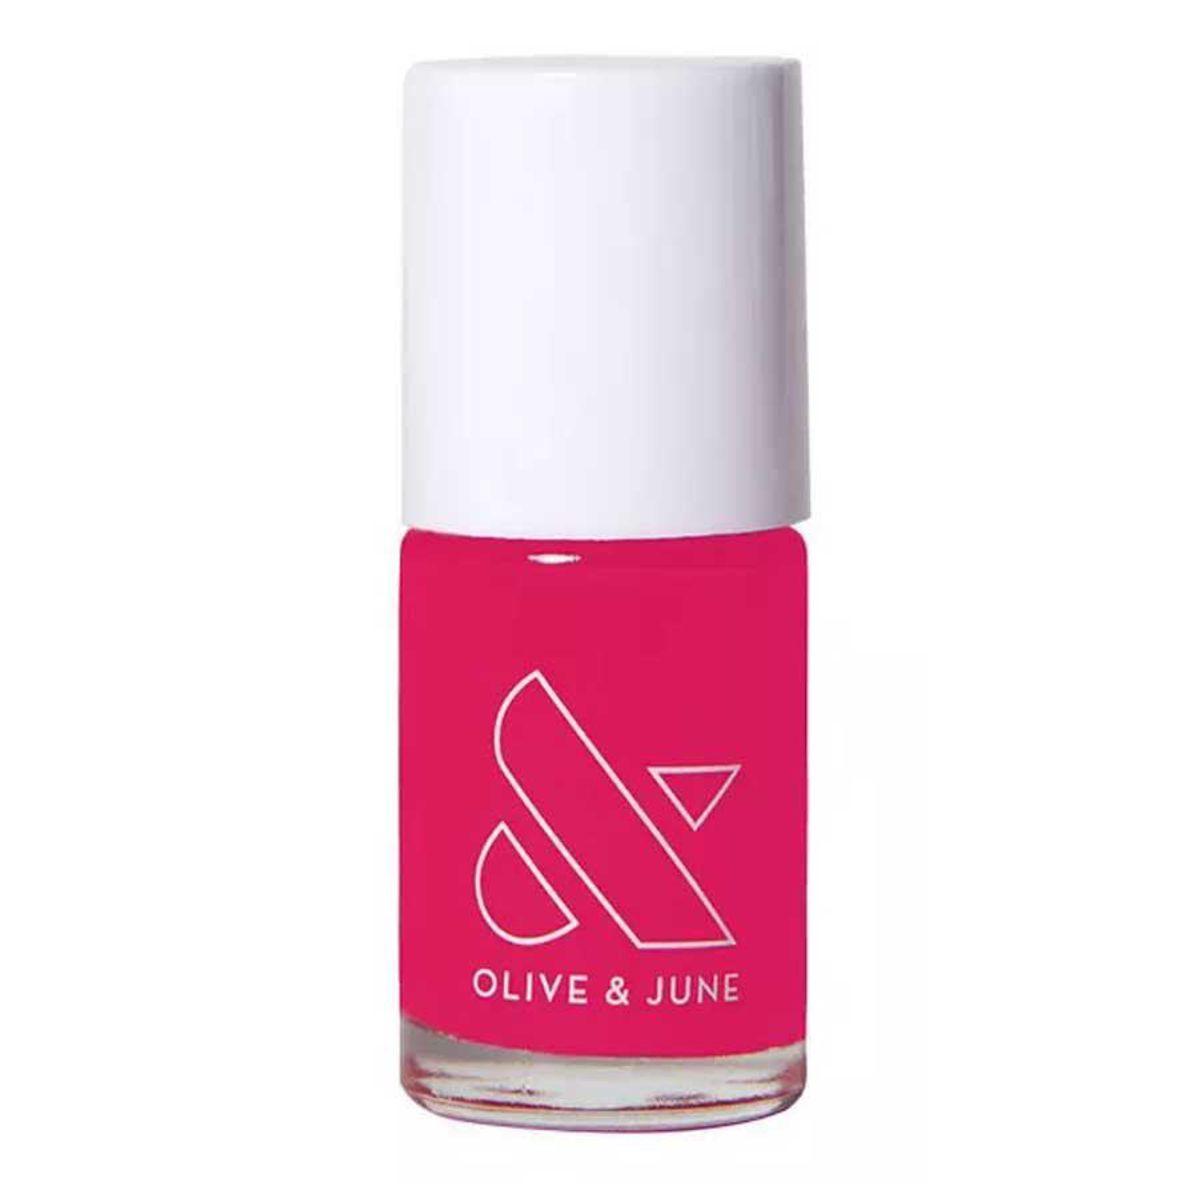 olive and june nail polish in xoxo